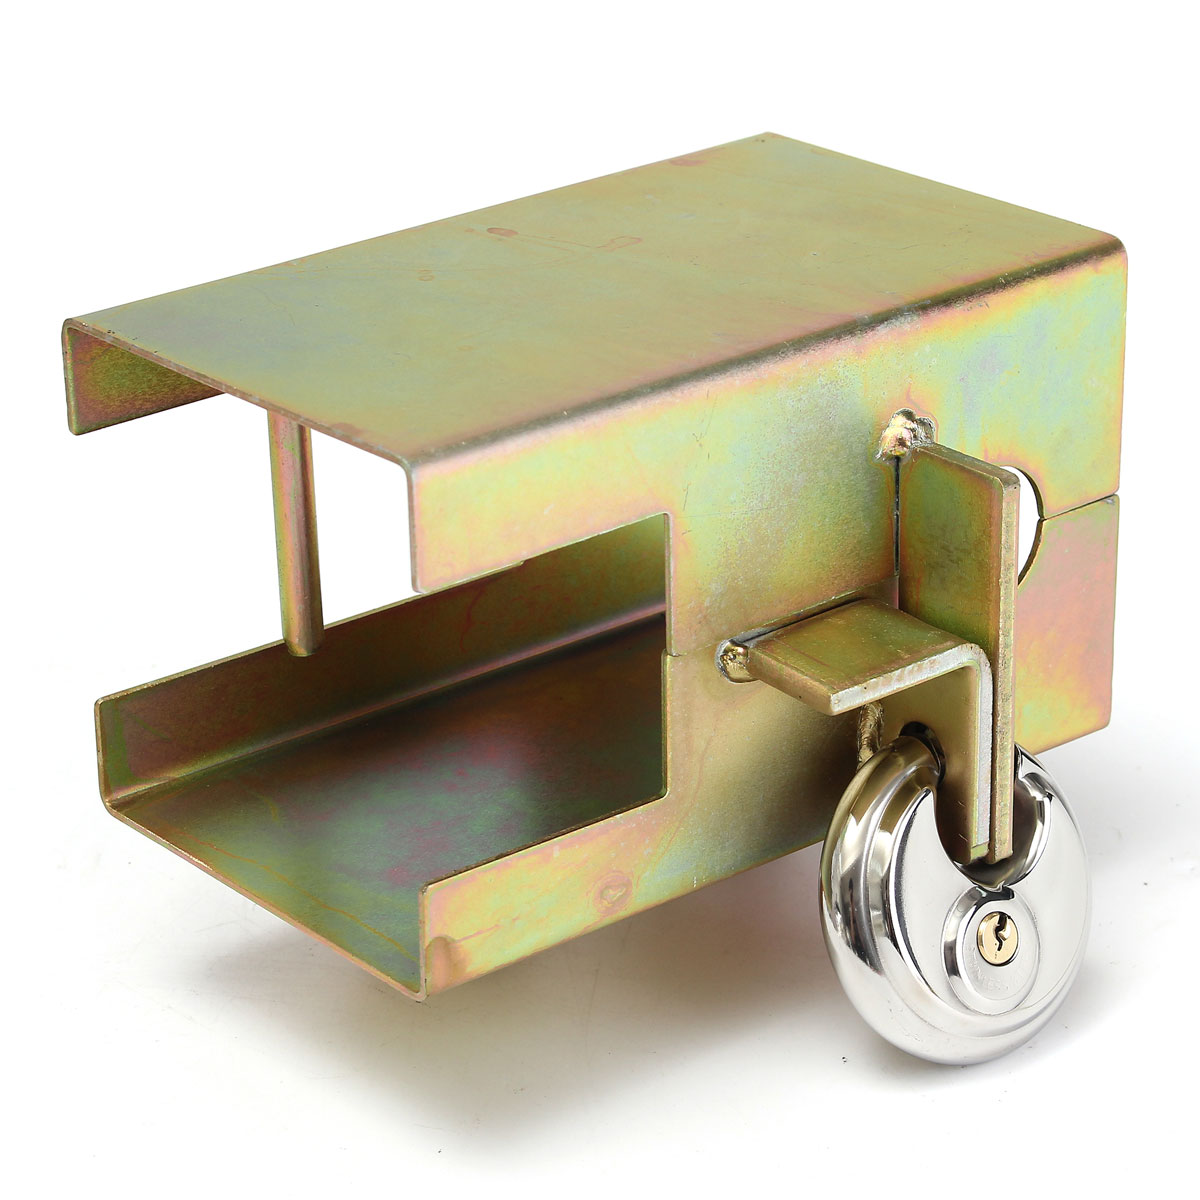 Audew Universal Metal Trailer Security Lock Tow Anti Theft Lock With 2 Keys